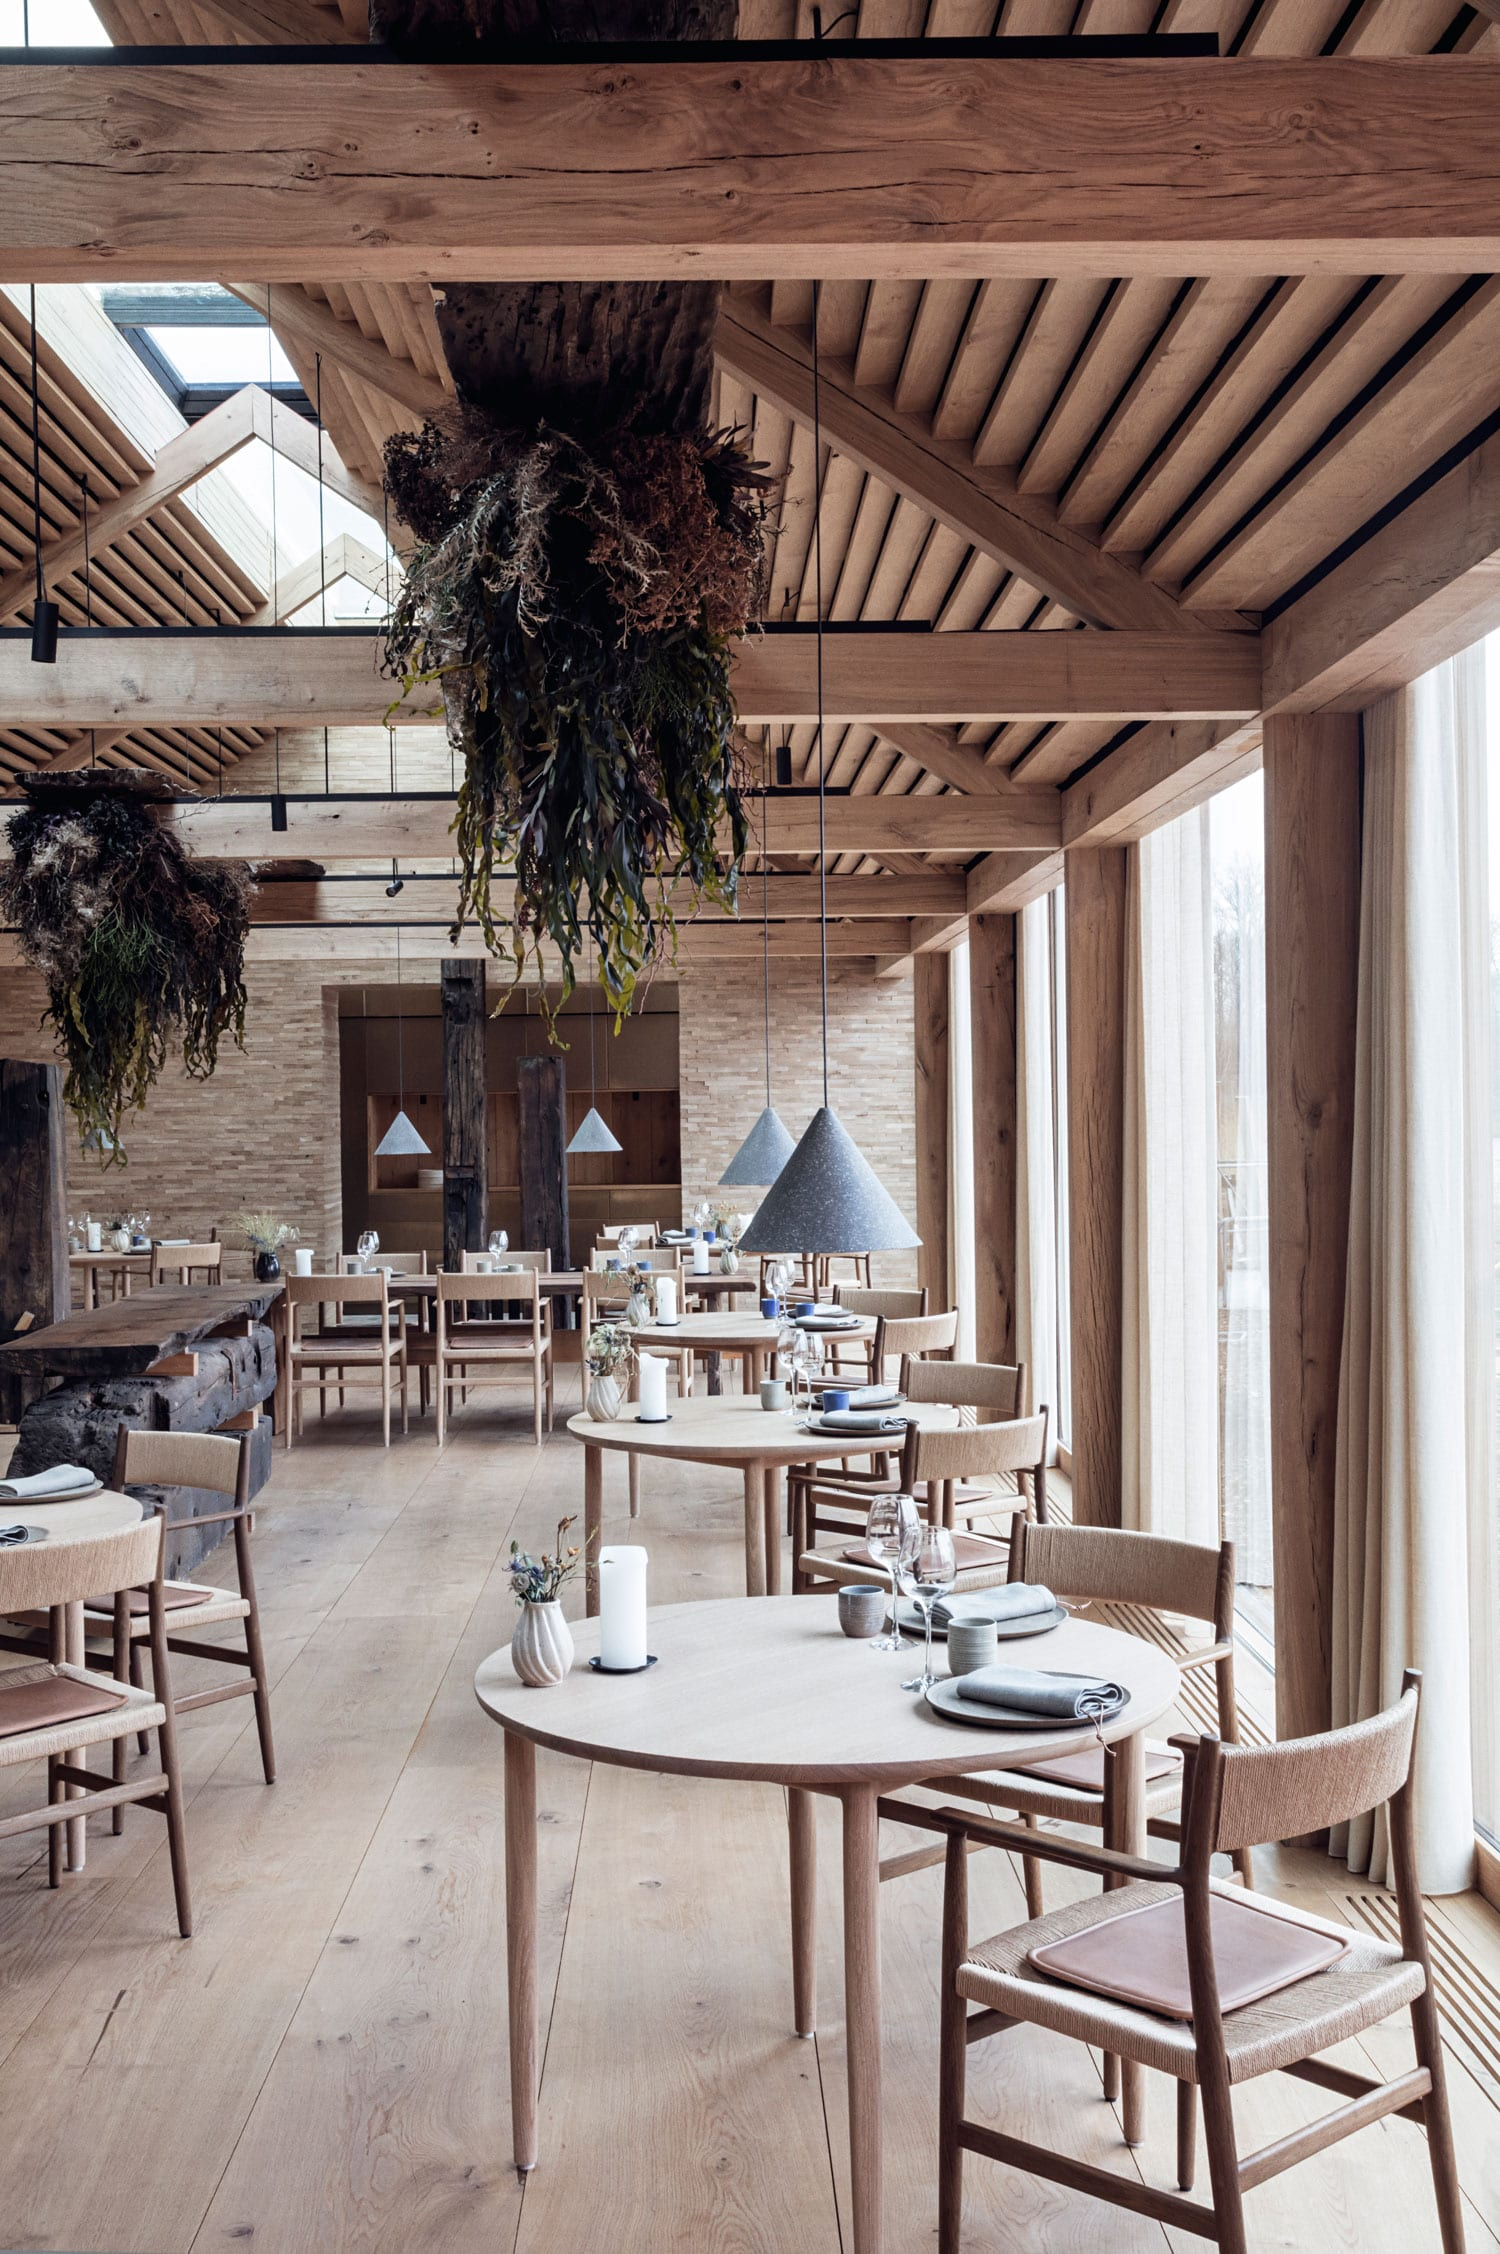 Noma Restaurant in Copenhagen by Studio Thulstrup ...